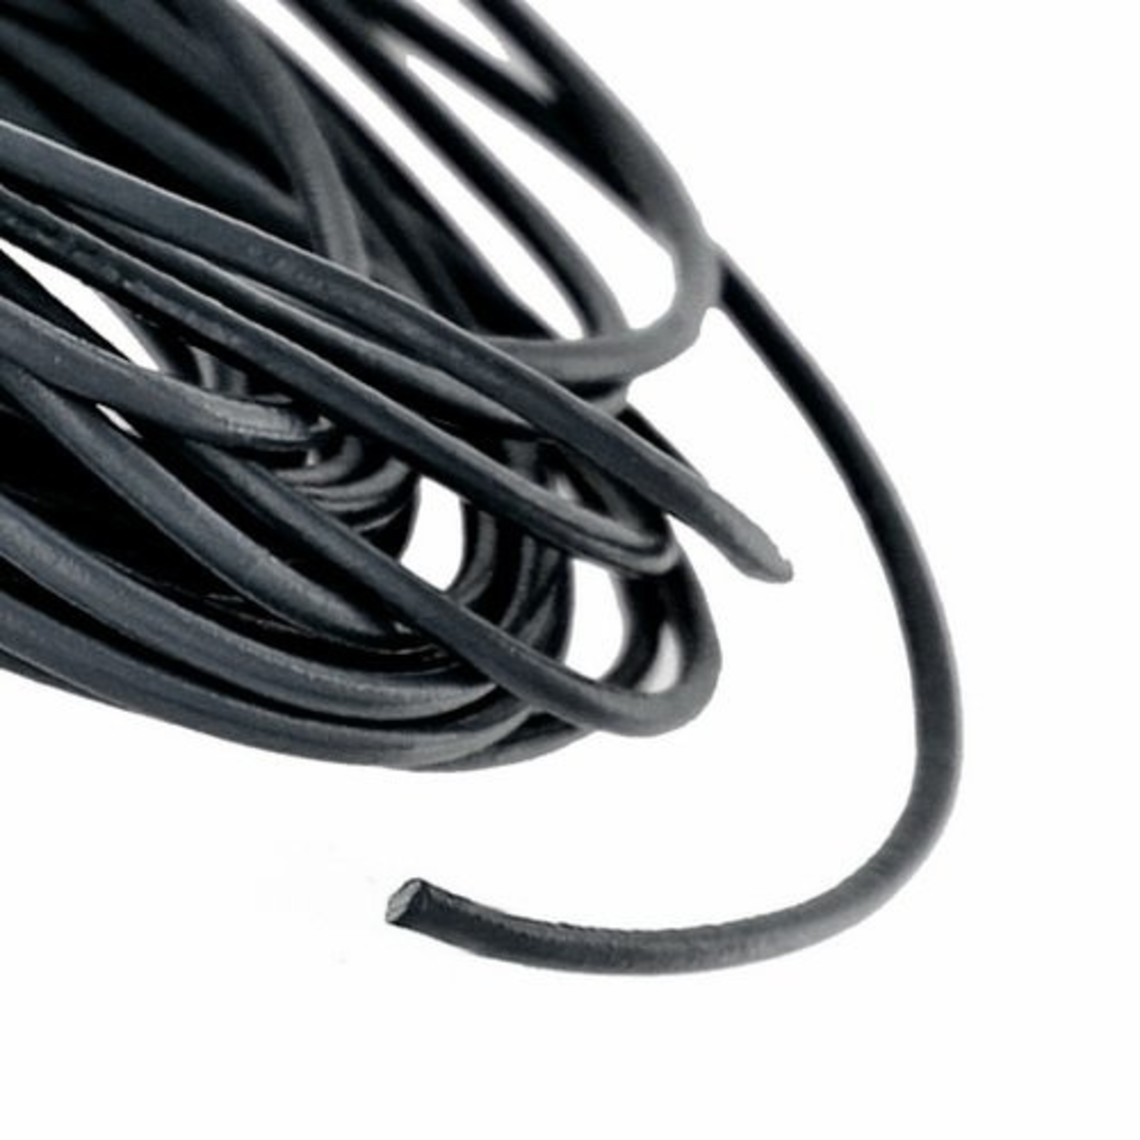 dentelle en cuir noir rond 3 mm x 50 m